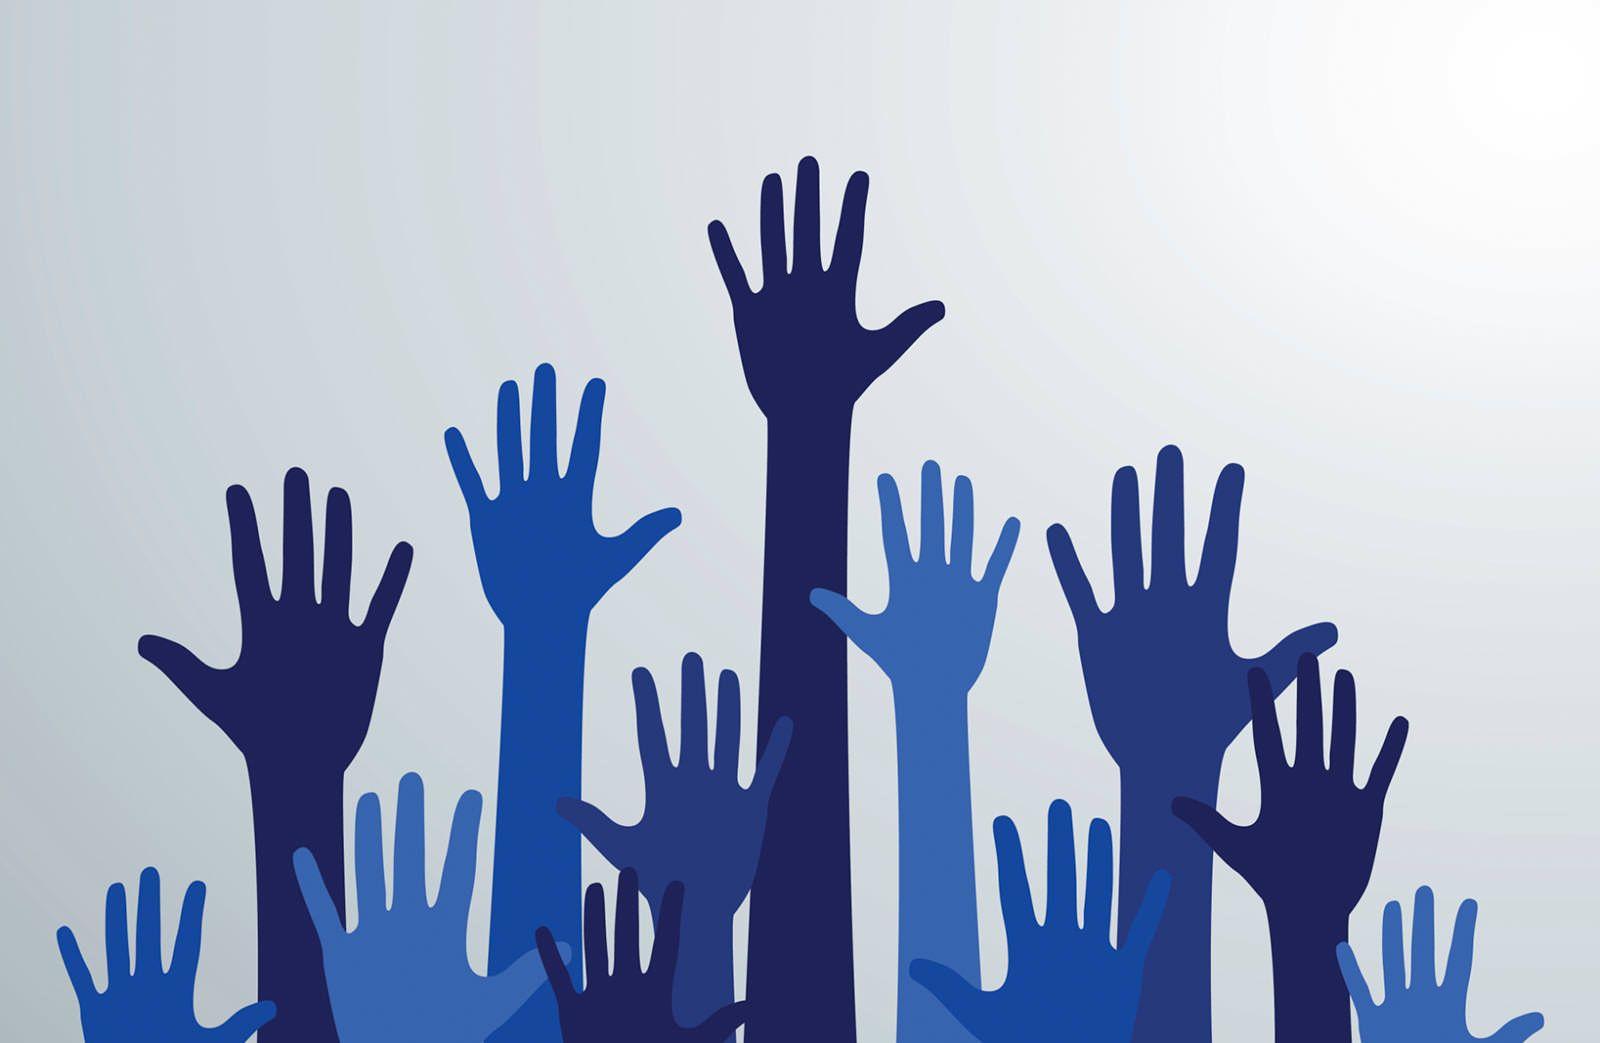 Global Usher Syndrome Awareness Day